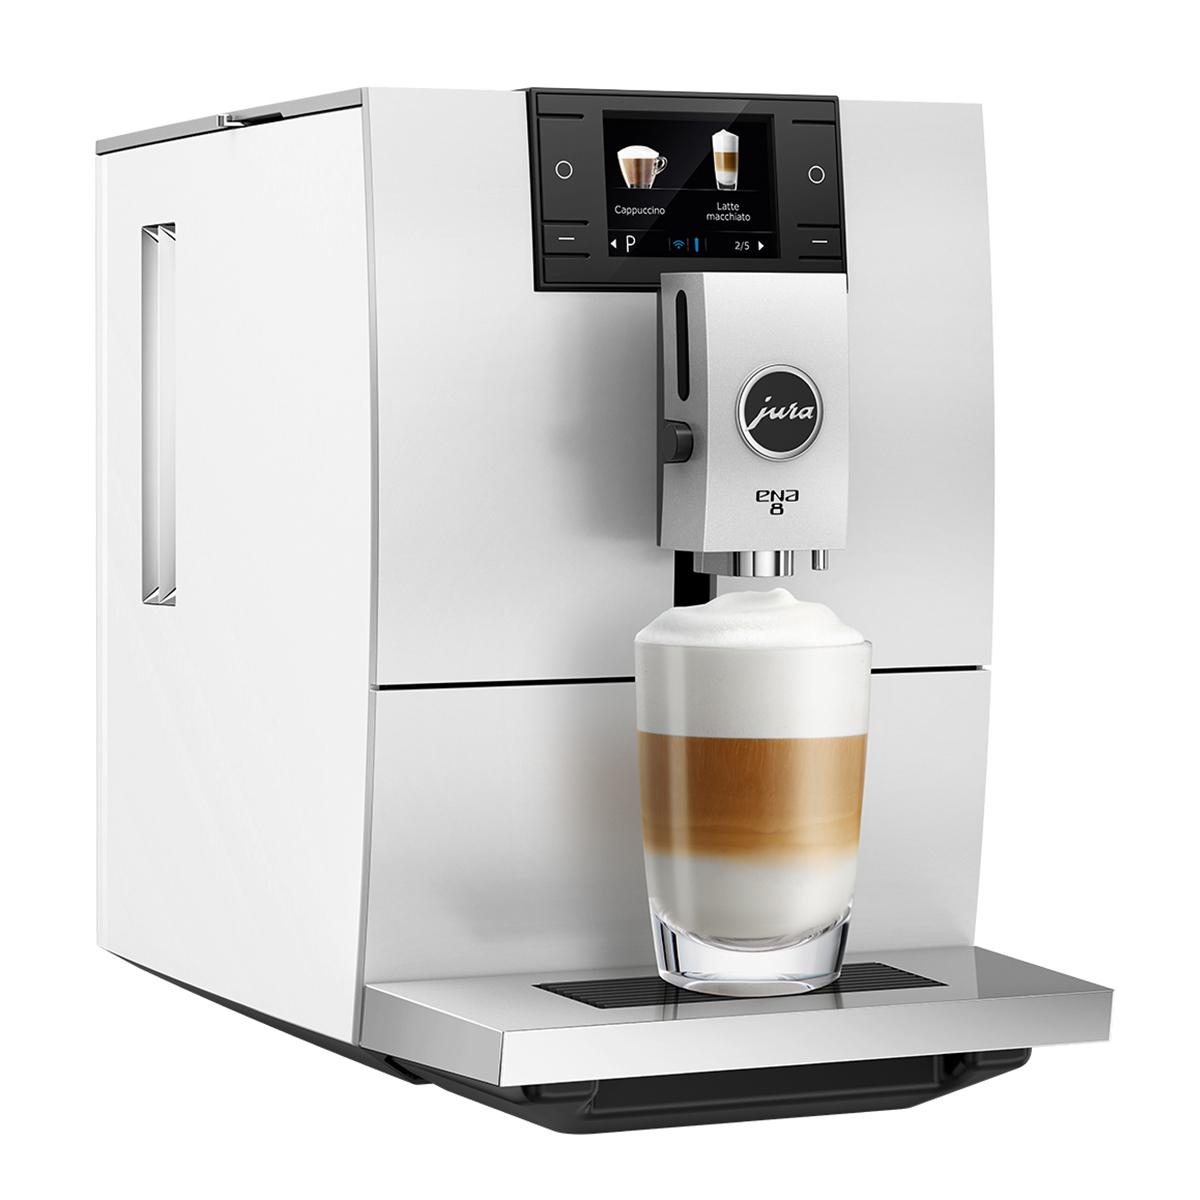 Espressor automat Jura ENA8, 15 bari, 1.1 l, 125g, rasnita AromaG3, 10 specialitati One Touch, afisaj color, Nordic White+ cafea cadou